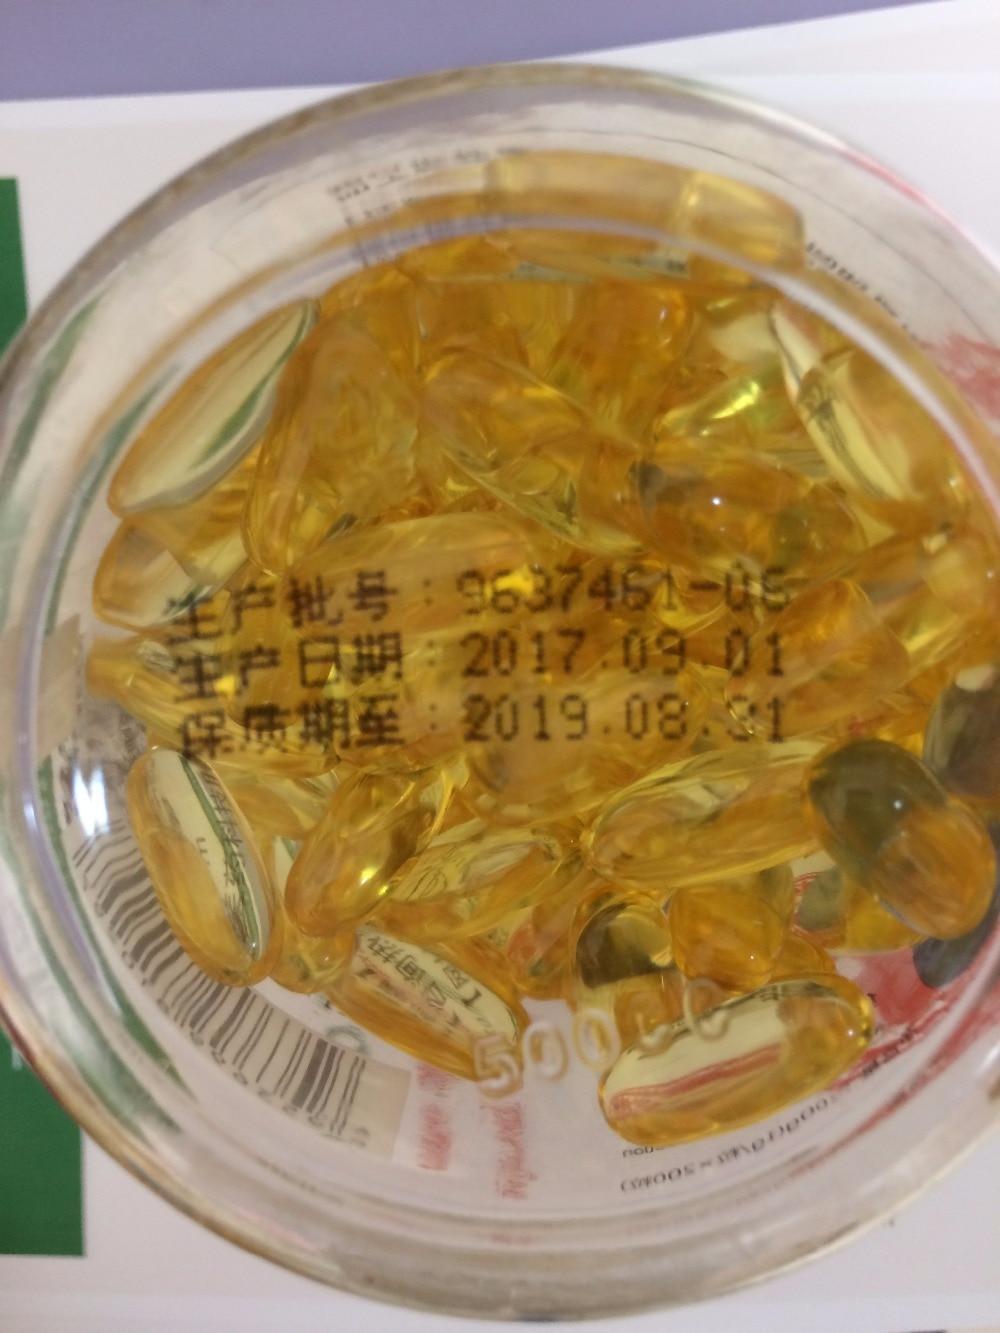 NEW Package 1000mg*200 Bottle Deep Sea Fish O-OILOmega (3) DHA & EPA Supplement Sports Nutrition